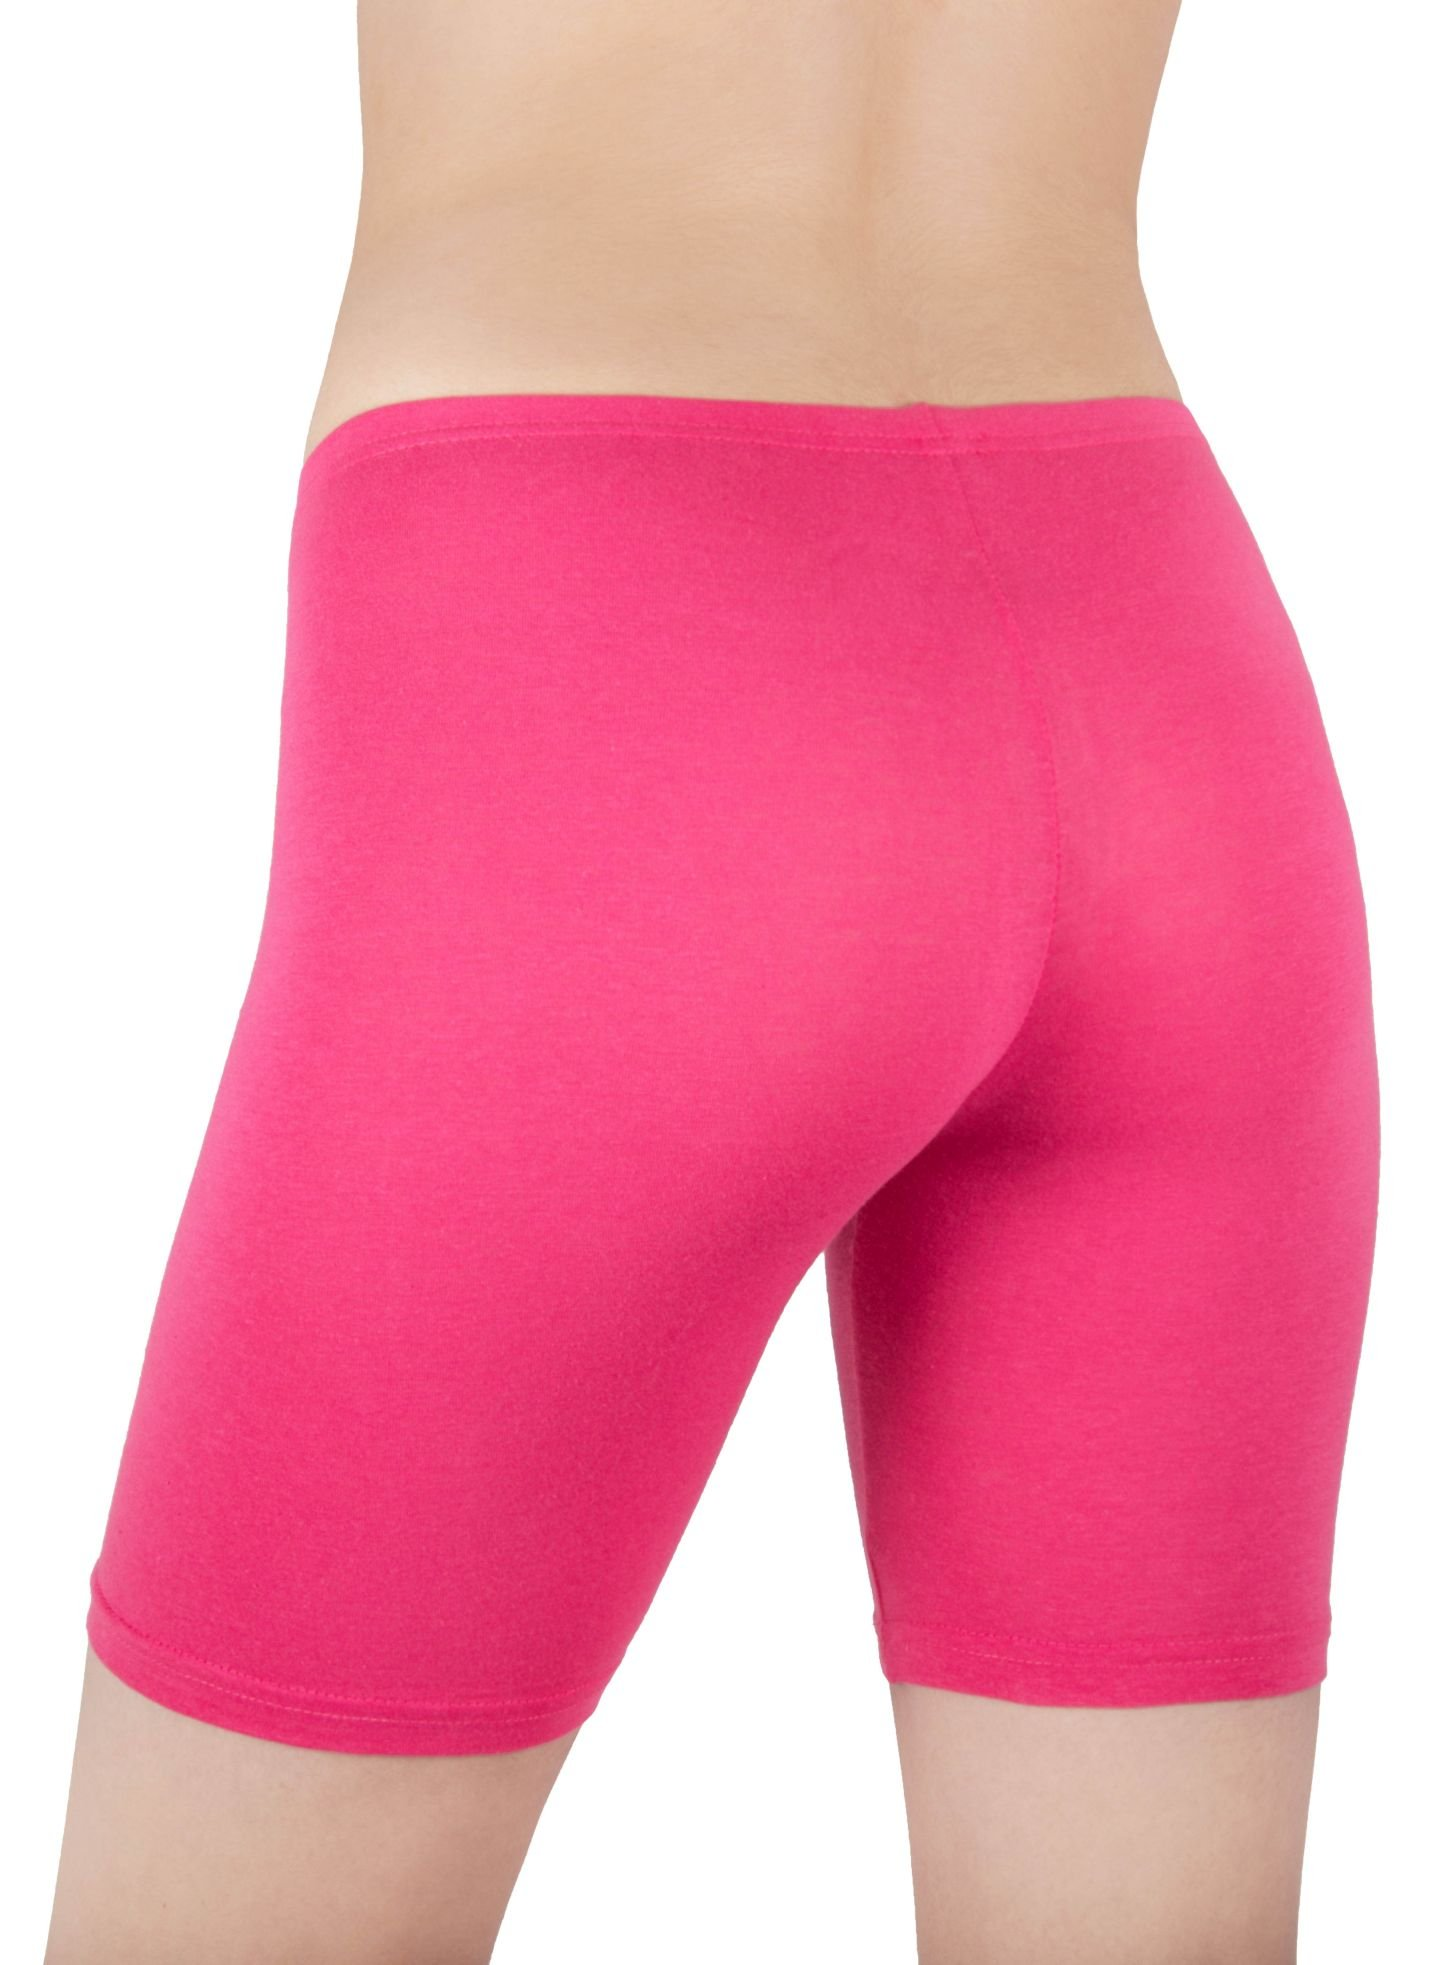 Sexy Basics Womens 3 Pack Sheer & Sexy Cotton Spandex Boyshort Yoga Bike Shorts (Medium -6, 3 PK BLACK) by Sexy Basics (Image #2)